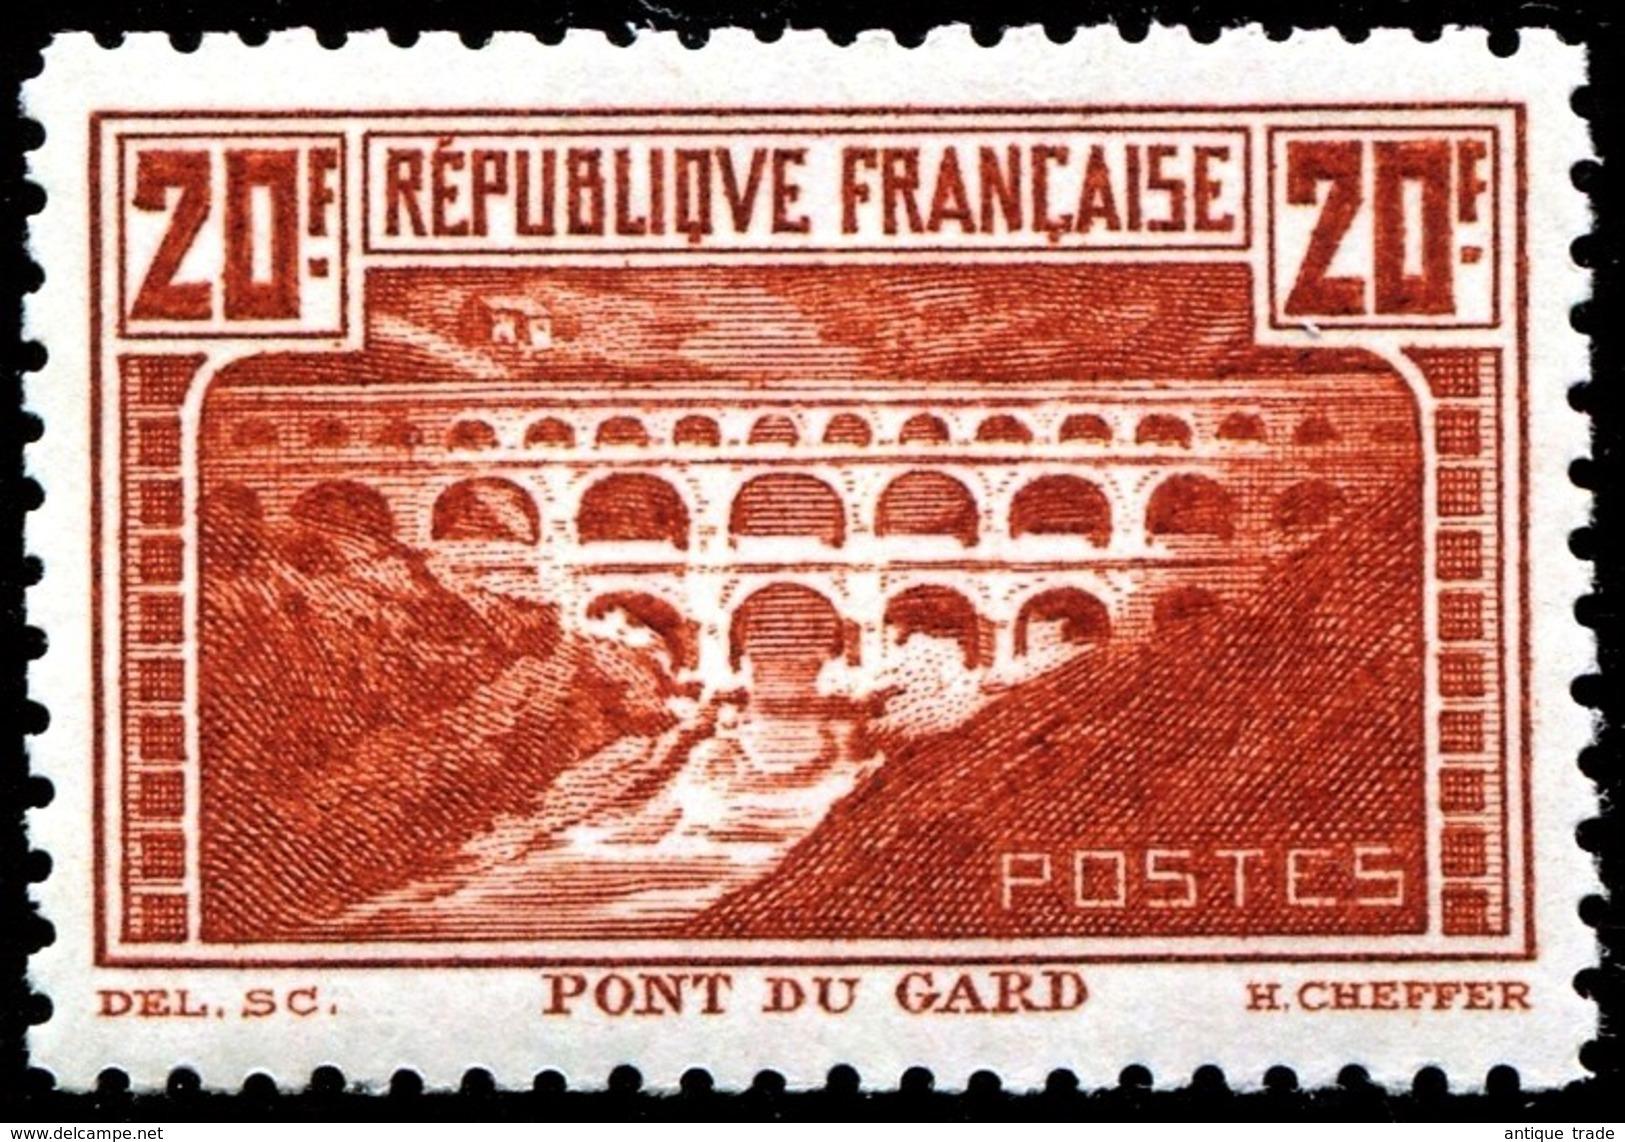 # FRANCE : Mi #242B Yv #262B (perf. 11) Pont Du Gard / Bridge (1930) MNH ** Neuf Well Centered / CV 2250.00 EUR - Ungebraucht